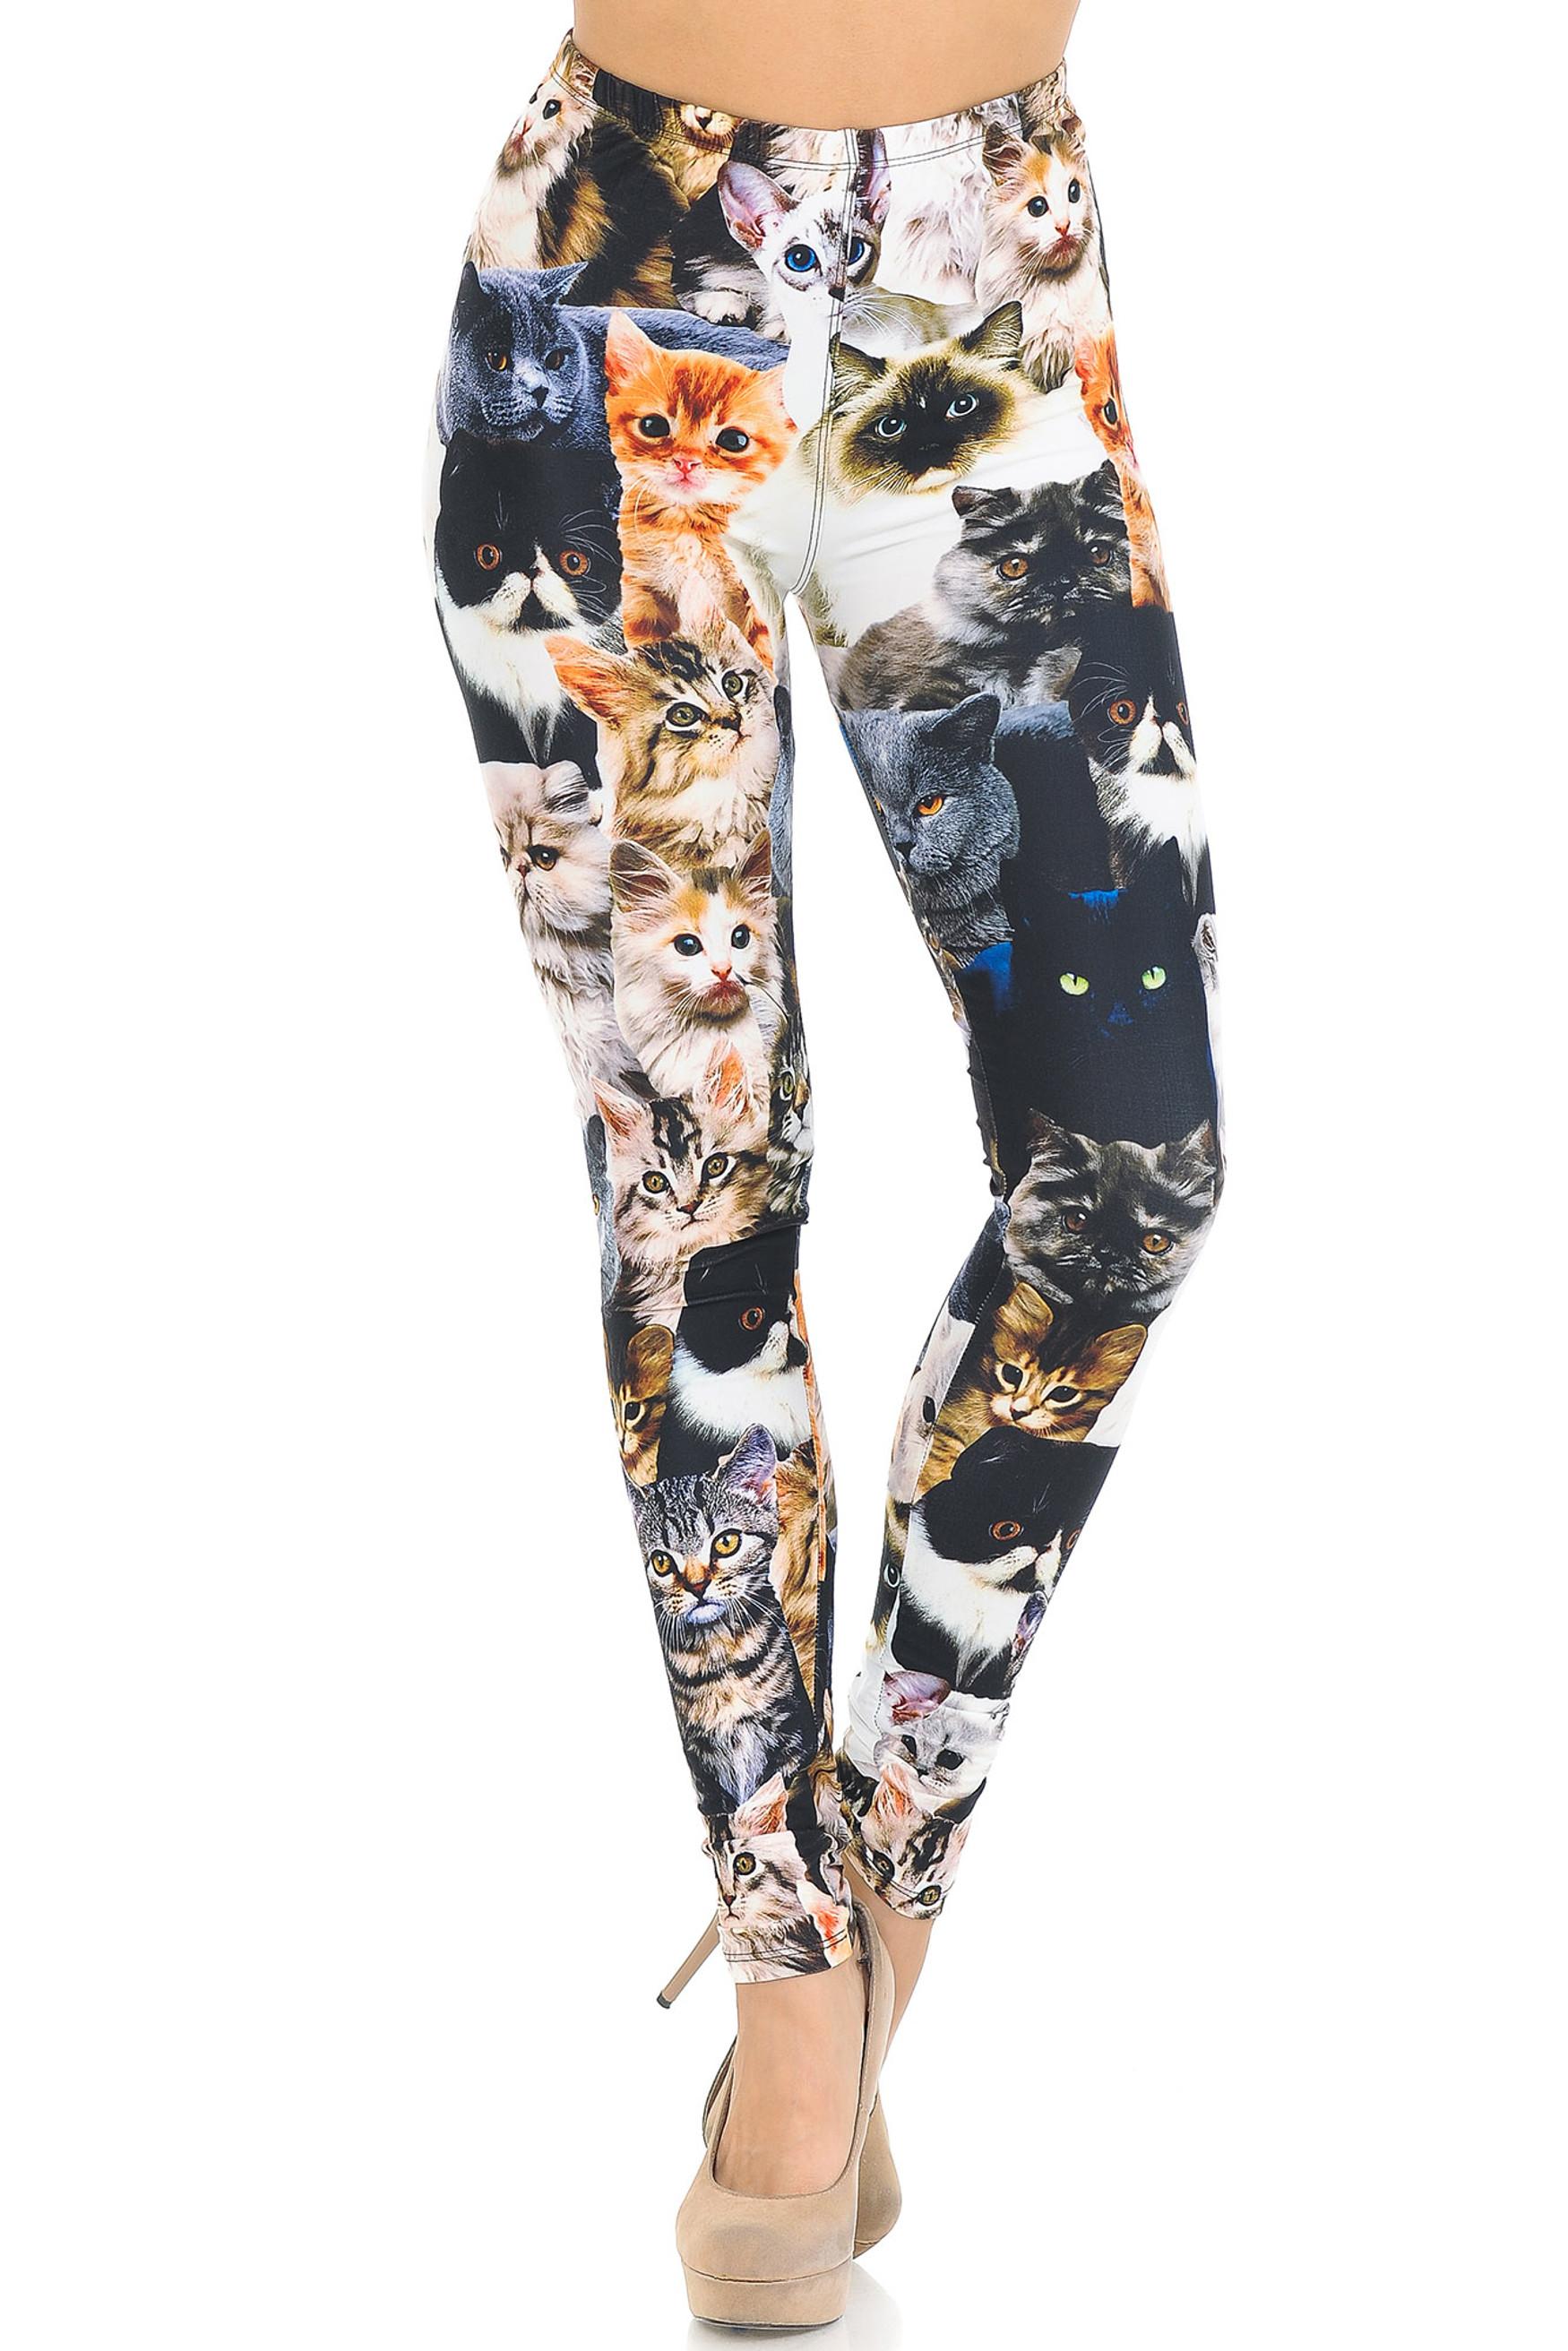 Creamy Soft Cat Collage Leggings - USA Fashion™